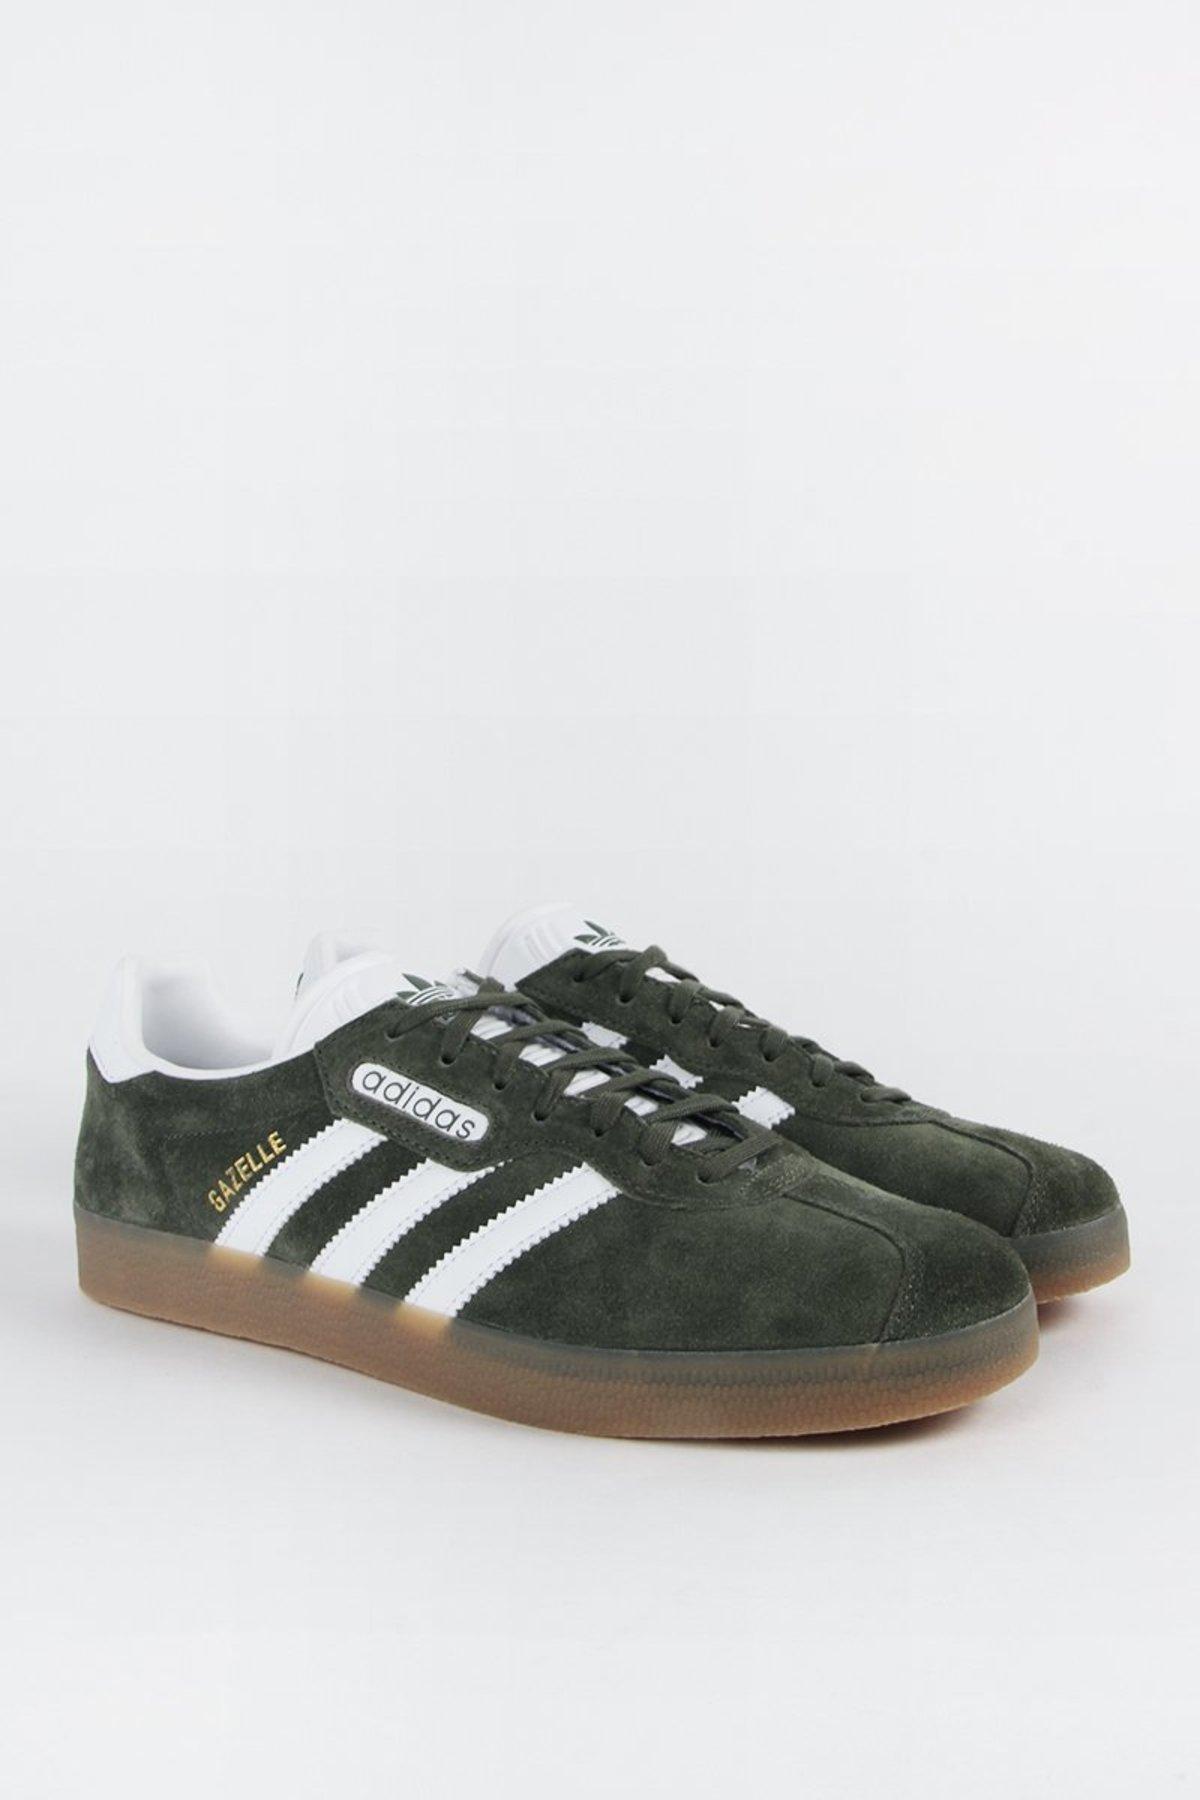 adidas gazelle super green